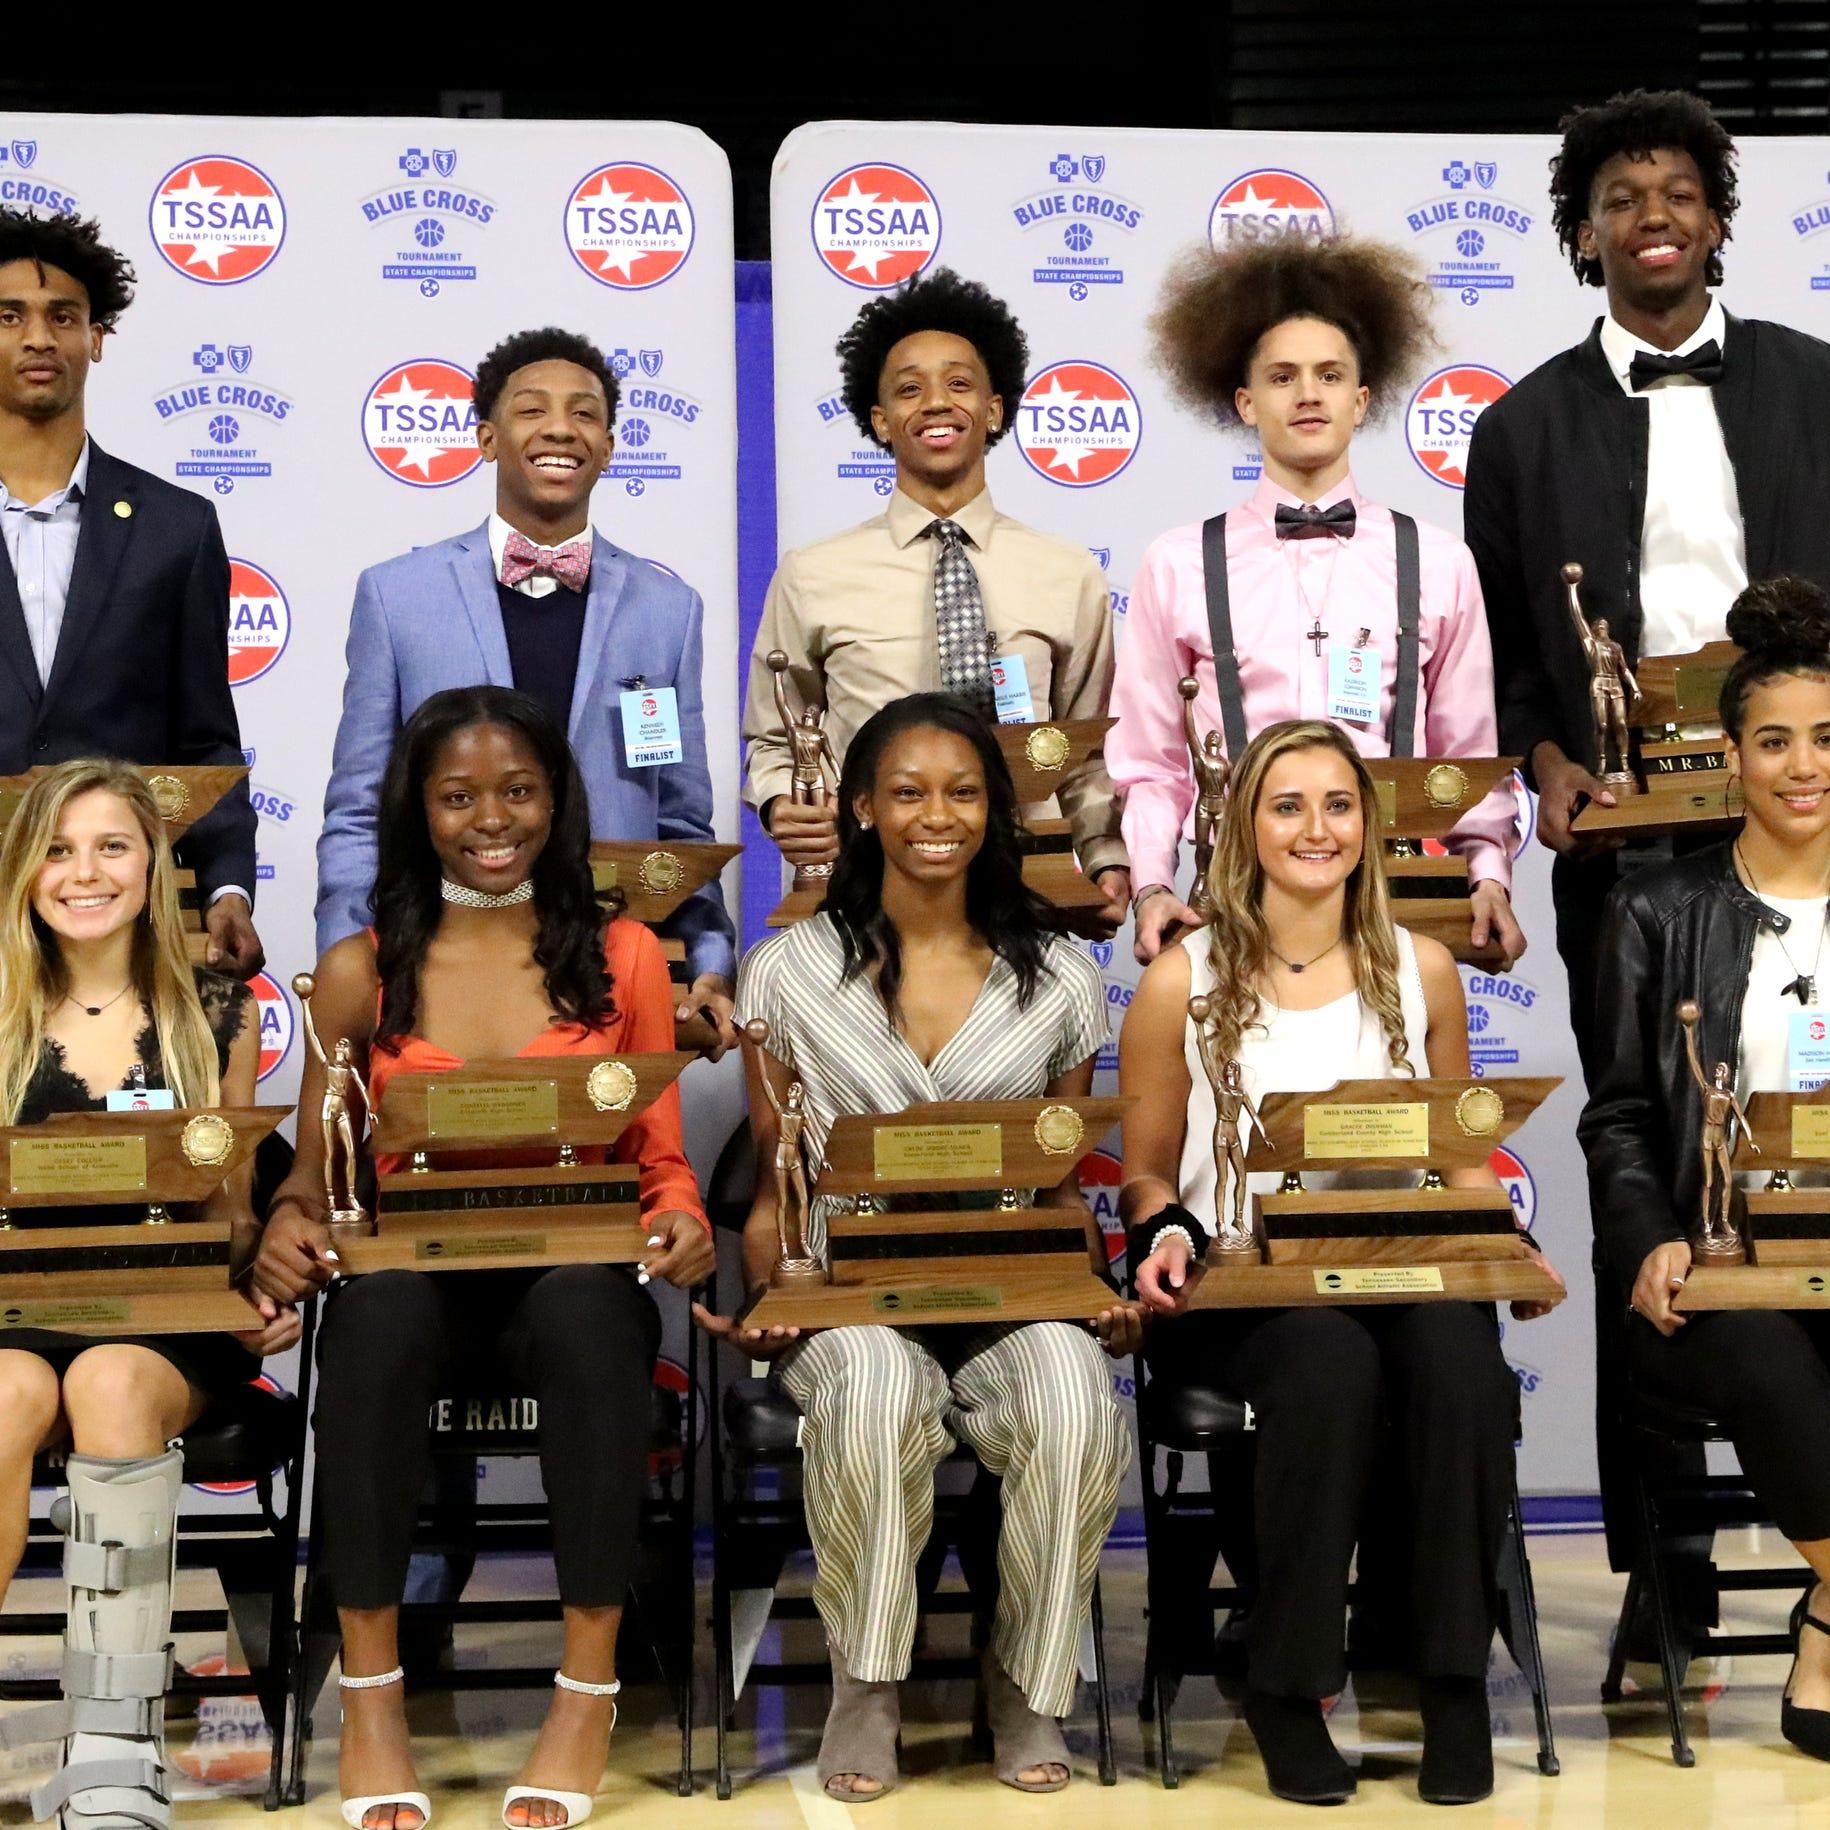 James Wiseman, Kennedy Chandler win Mr. Basketball awards